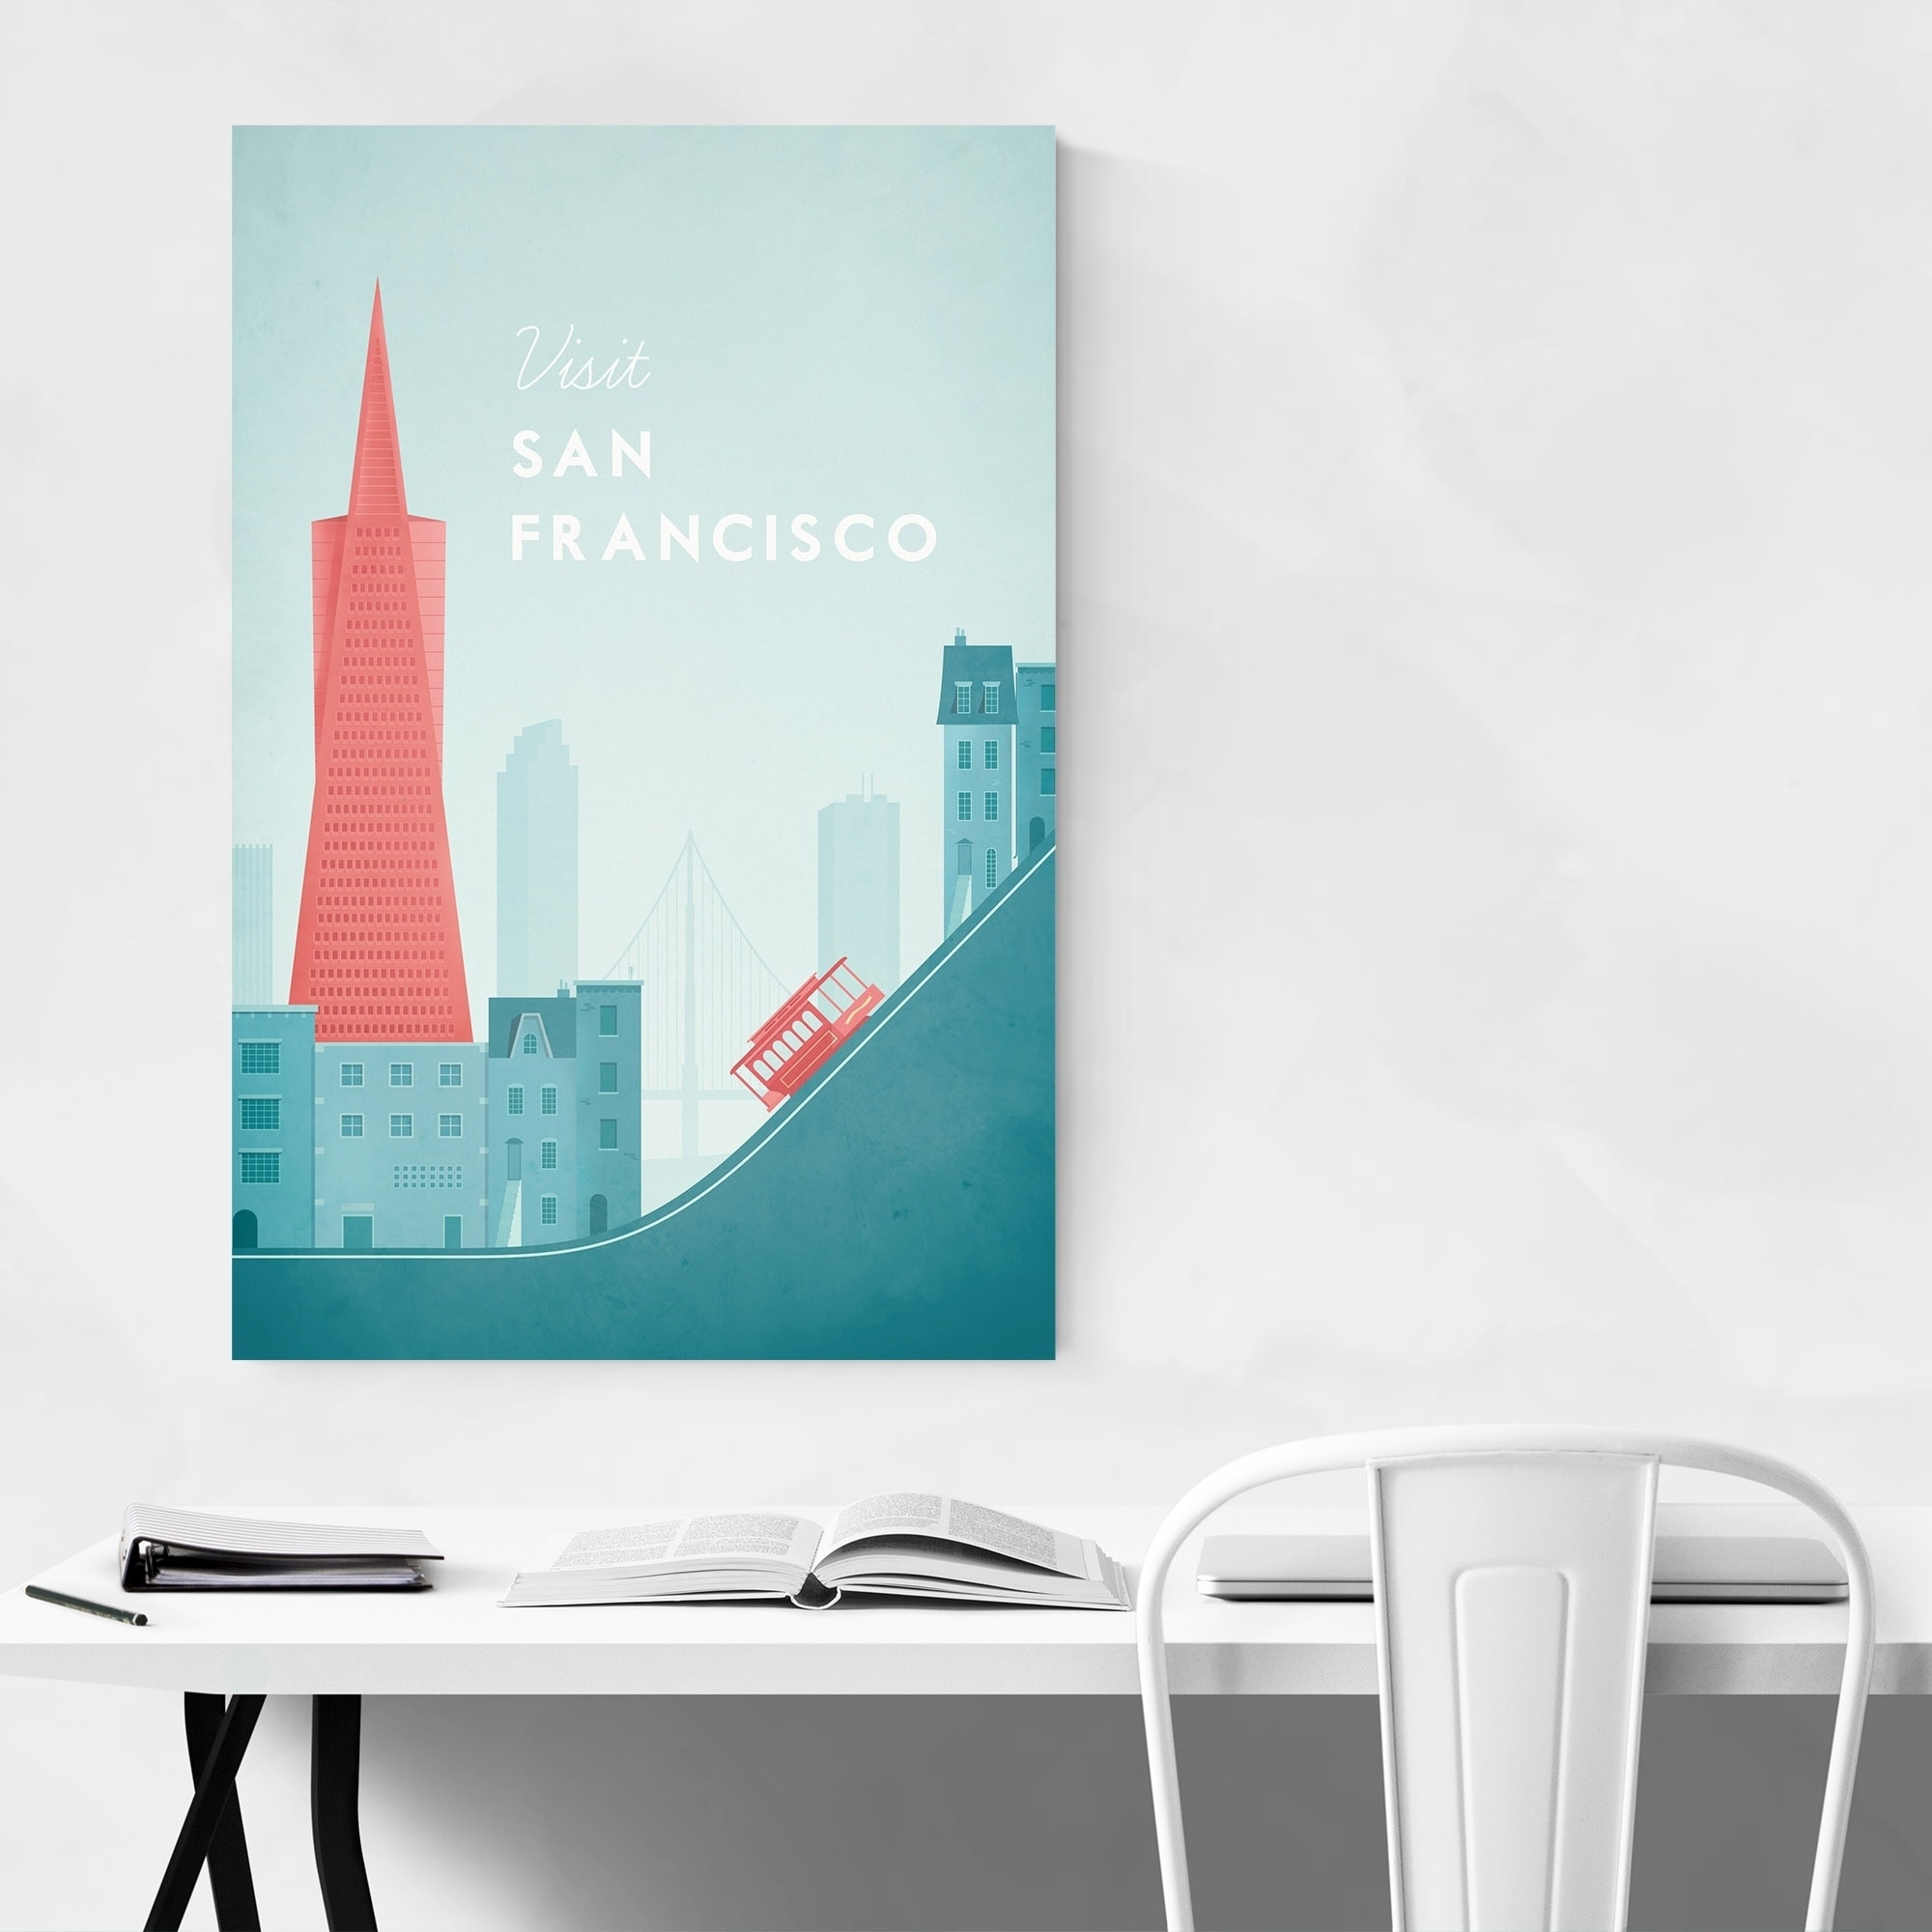 Noir Gallery Minimal Travel San Francisco Unframed Art Print/Poster